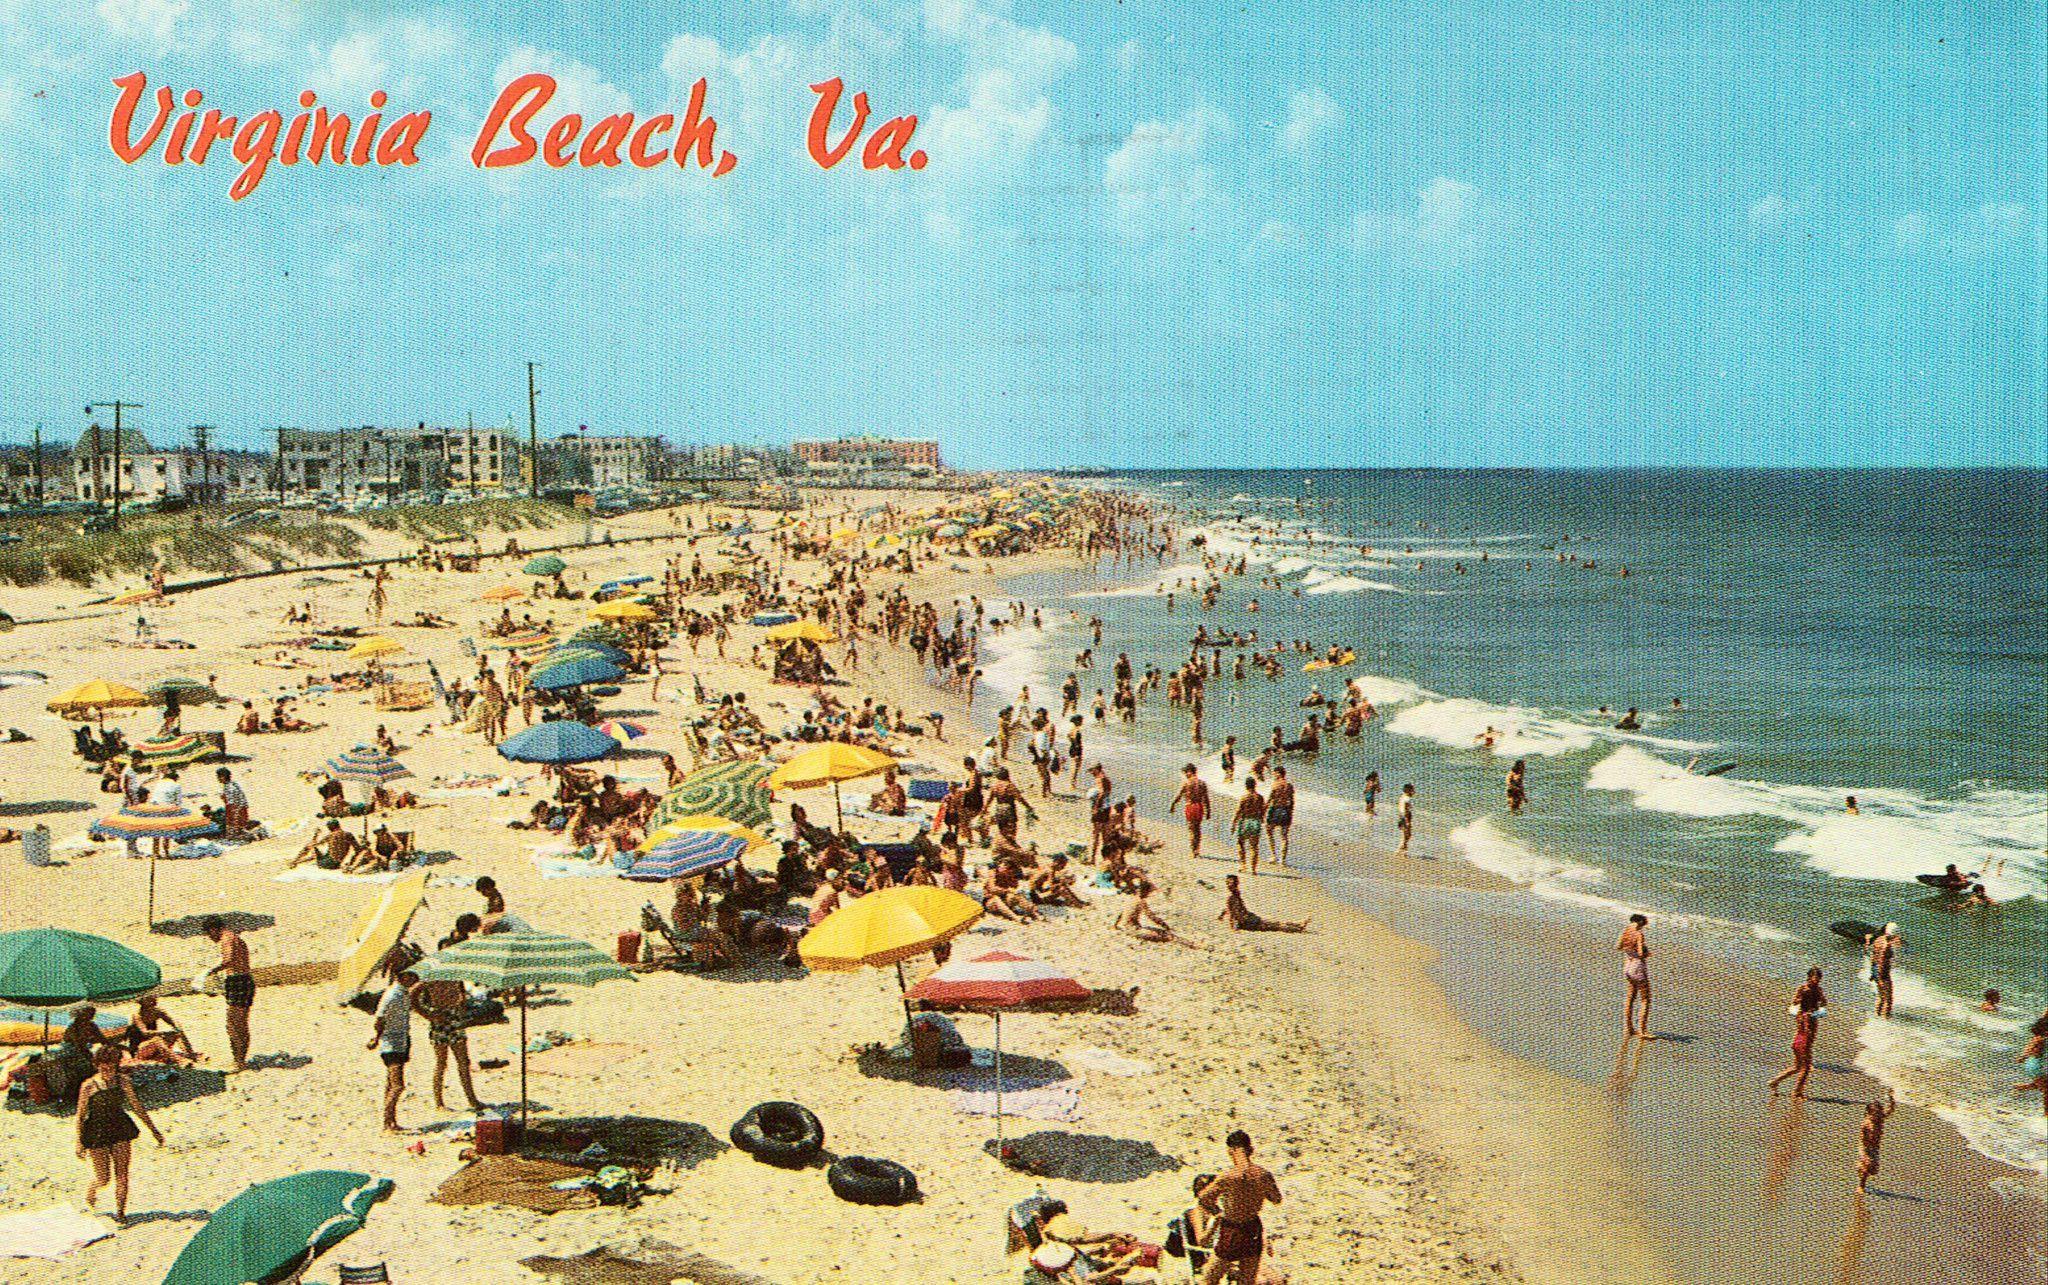 Vintage Virginia Beach Postcards 1964 Norfolk Va Postmark Published By Rowe Distributing Co S 5211 6 Item B4260